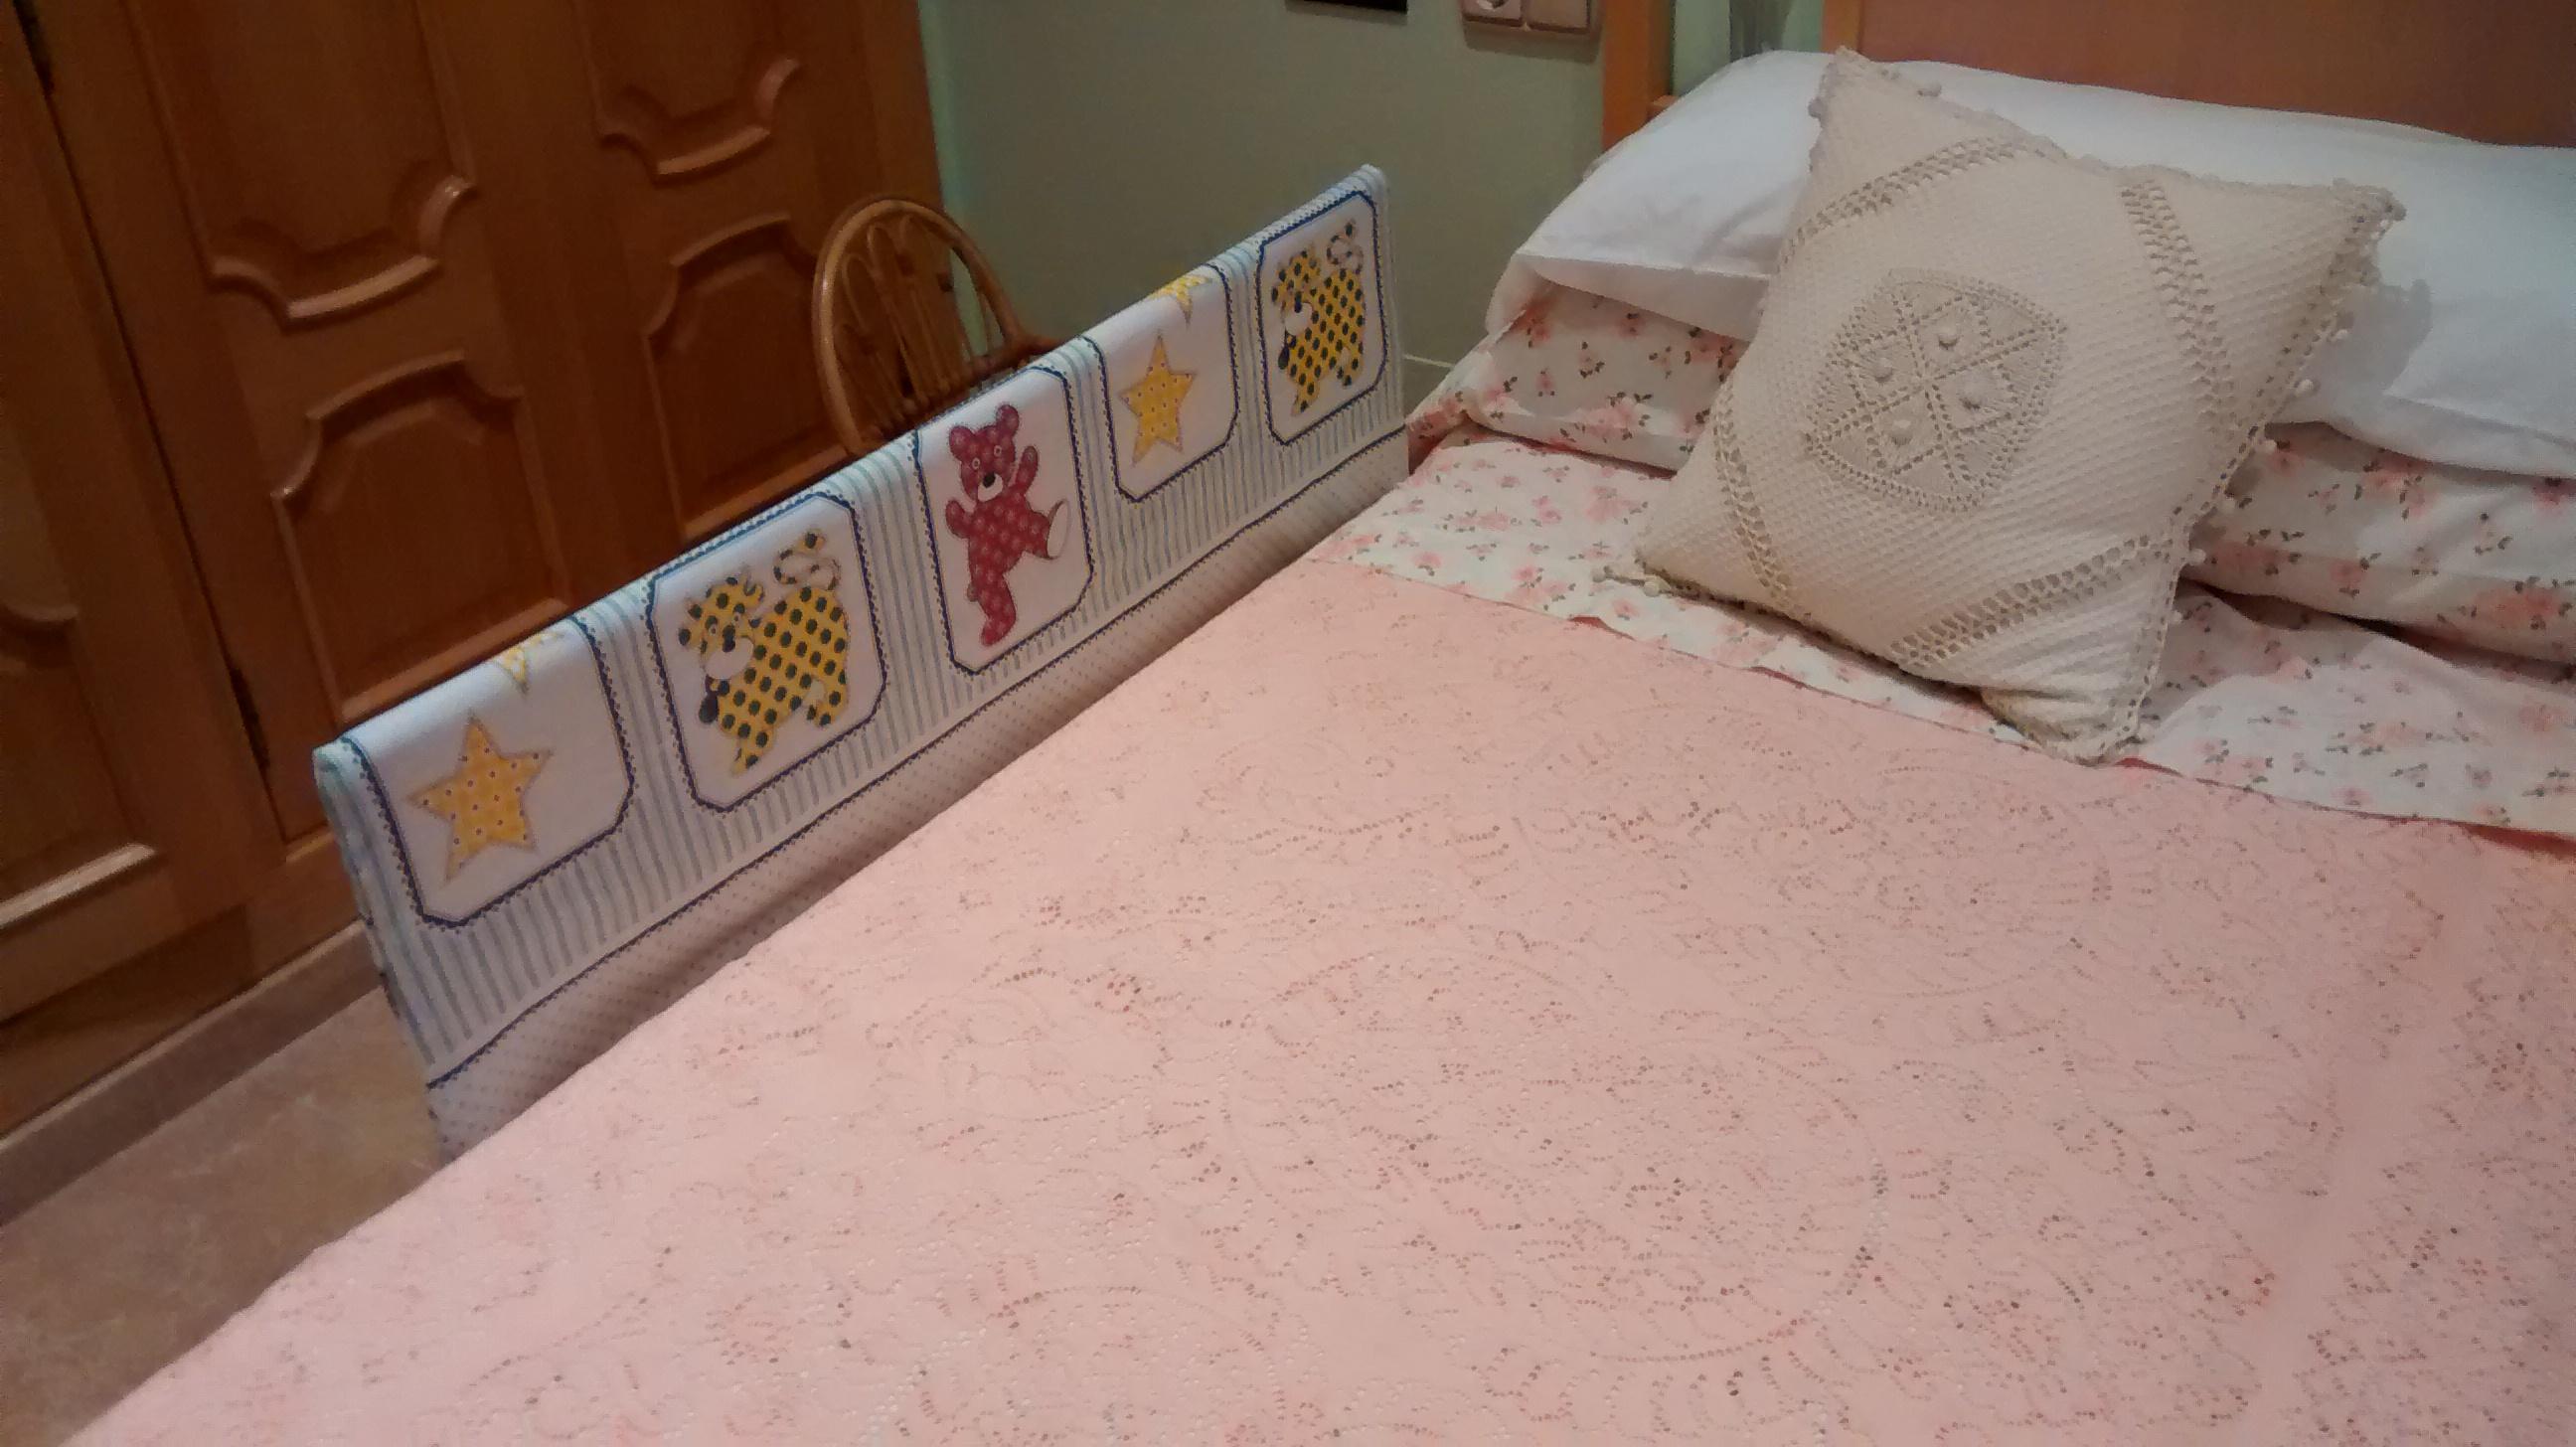 Barreras anticaida para la cama usando PVC